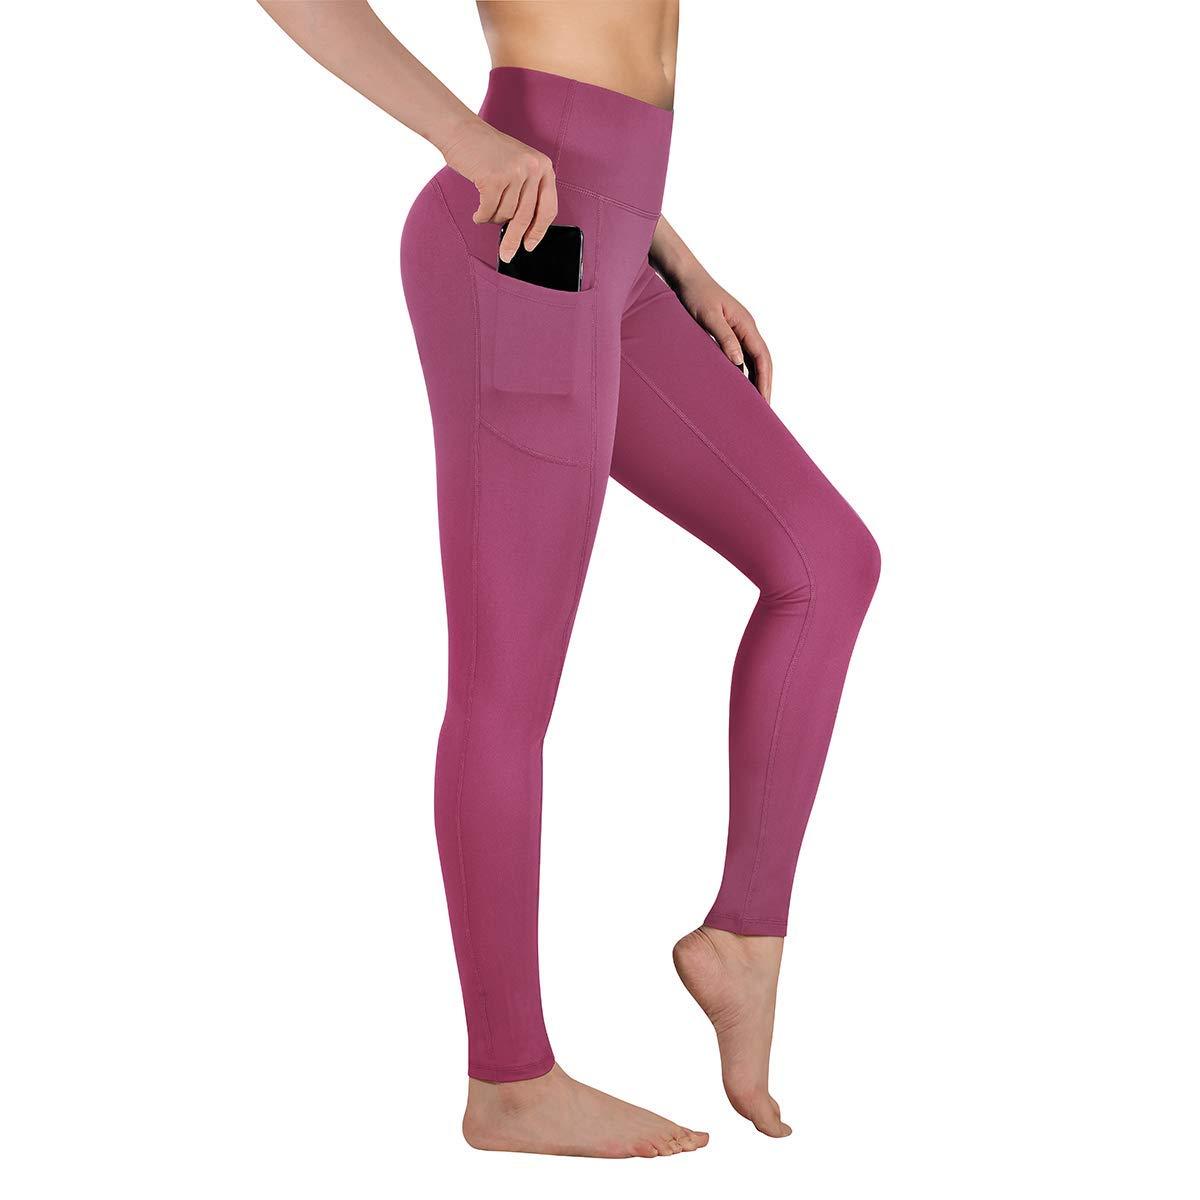 Duduma Yoga Pants for Women with Pockets Flex Tummy Control Workout Running 4 Way Stretch High Waist Sports Leggings DU1098